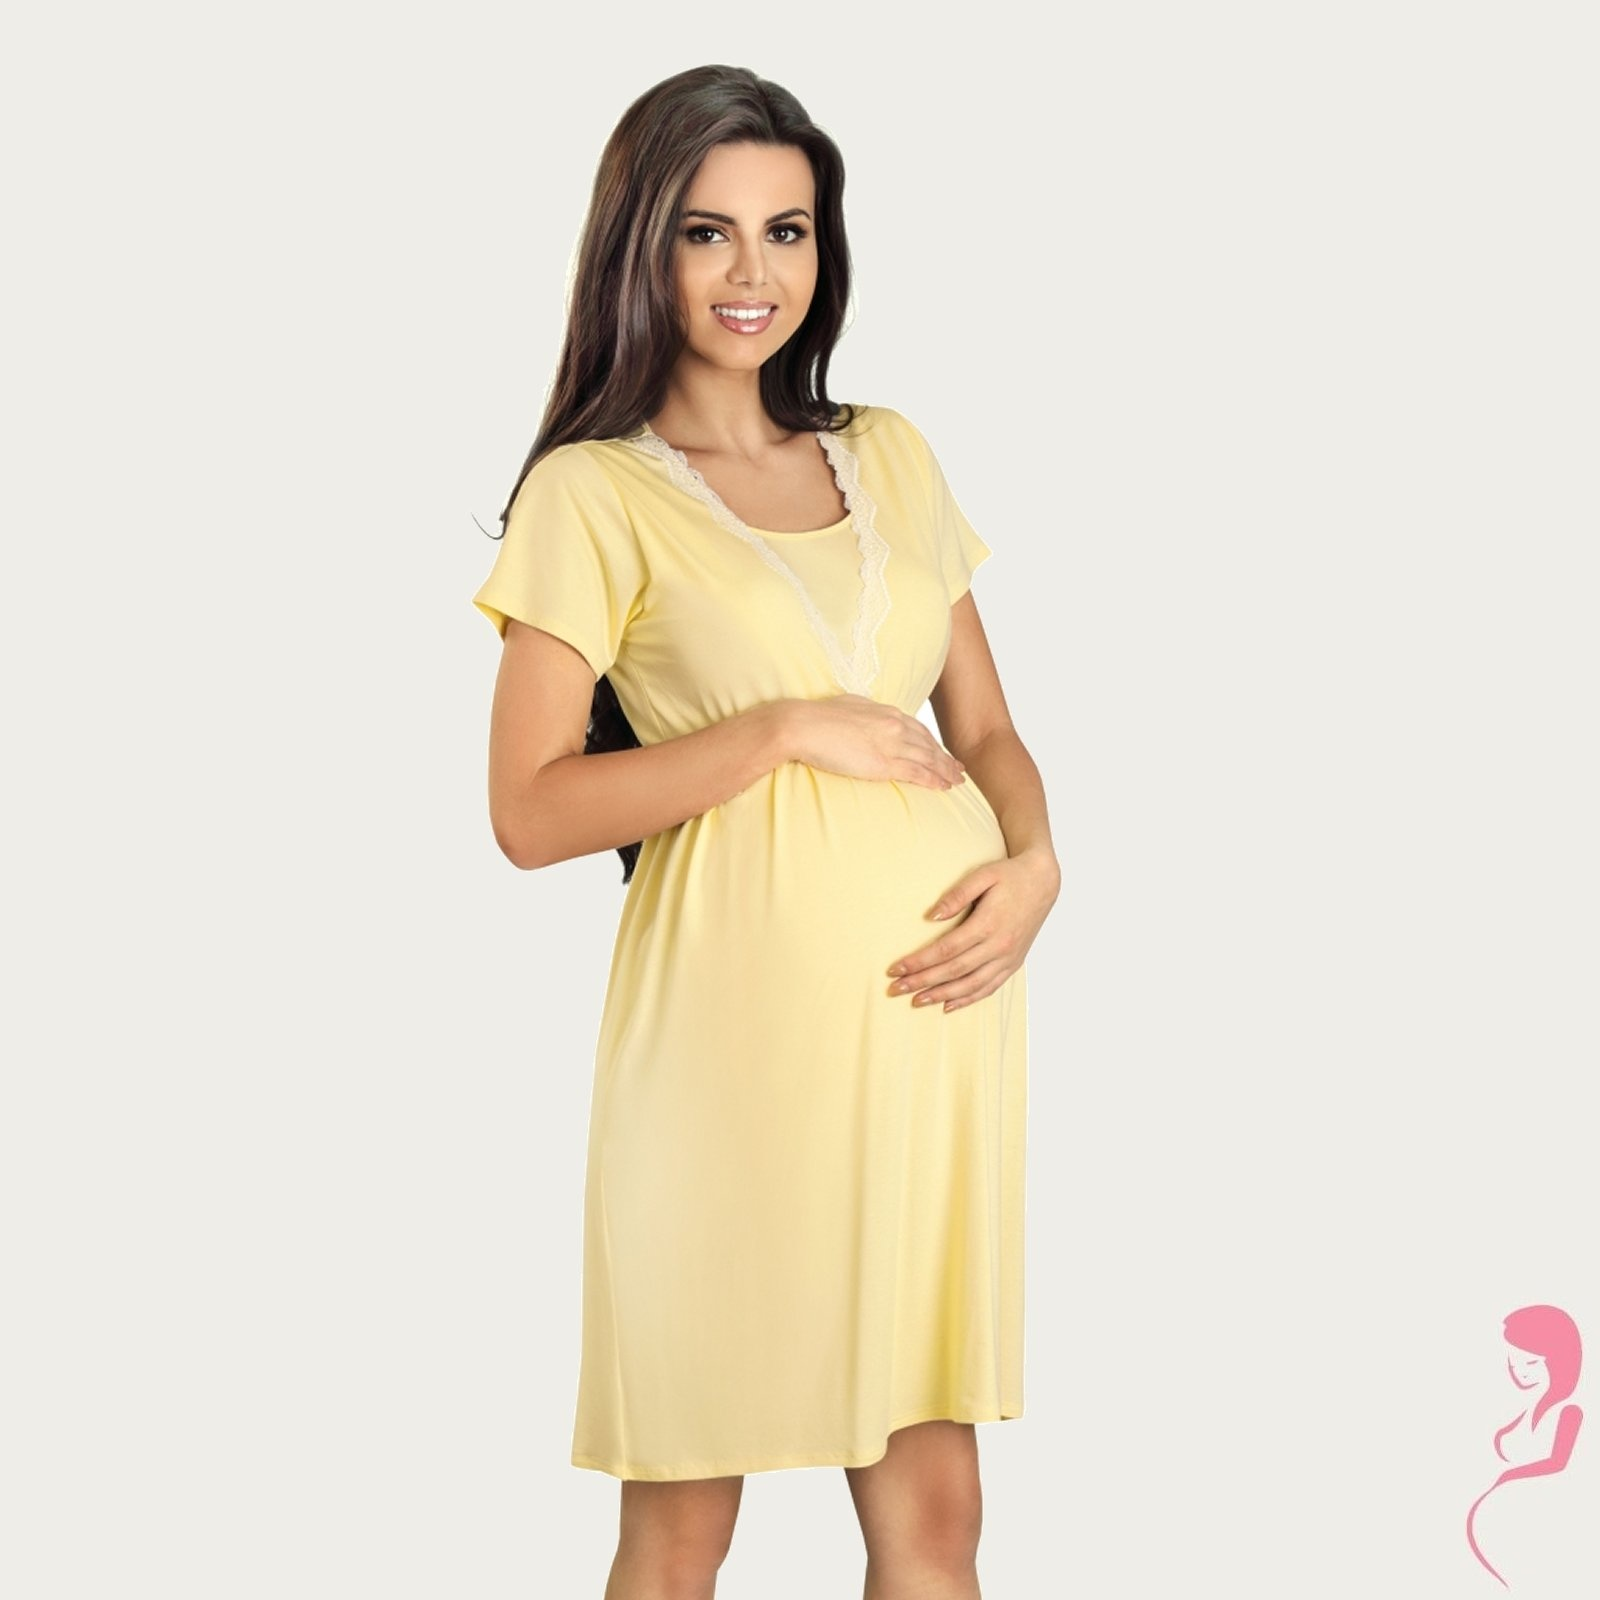 Lupoline Zwangerschapsjurk - Voedingsjurk Vanilla